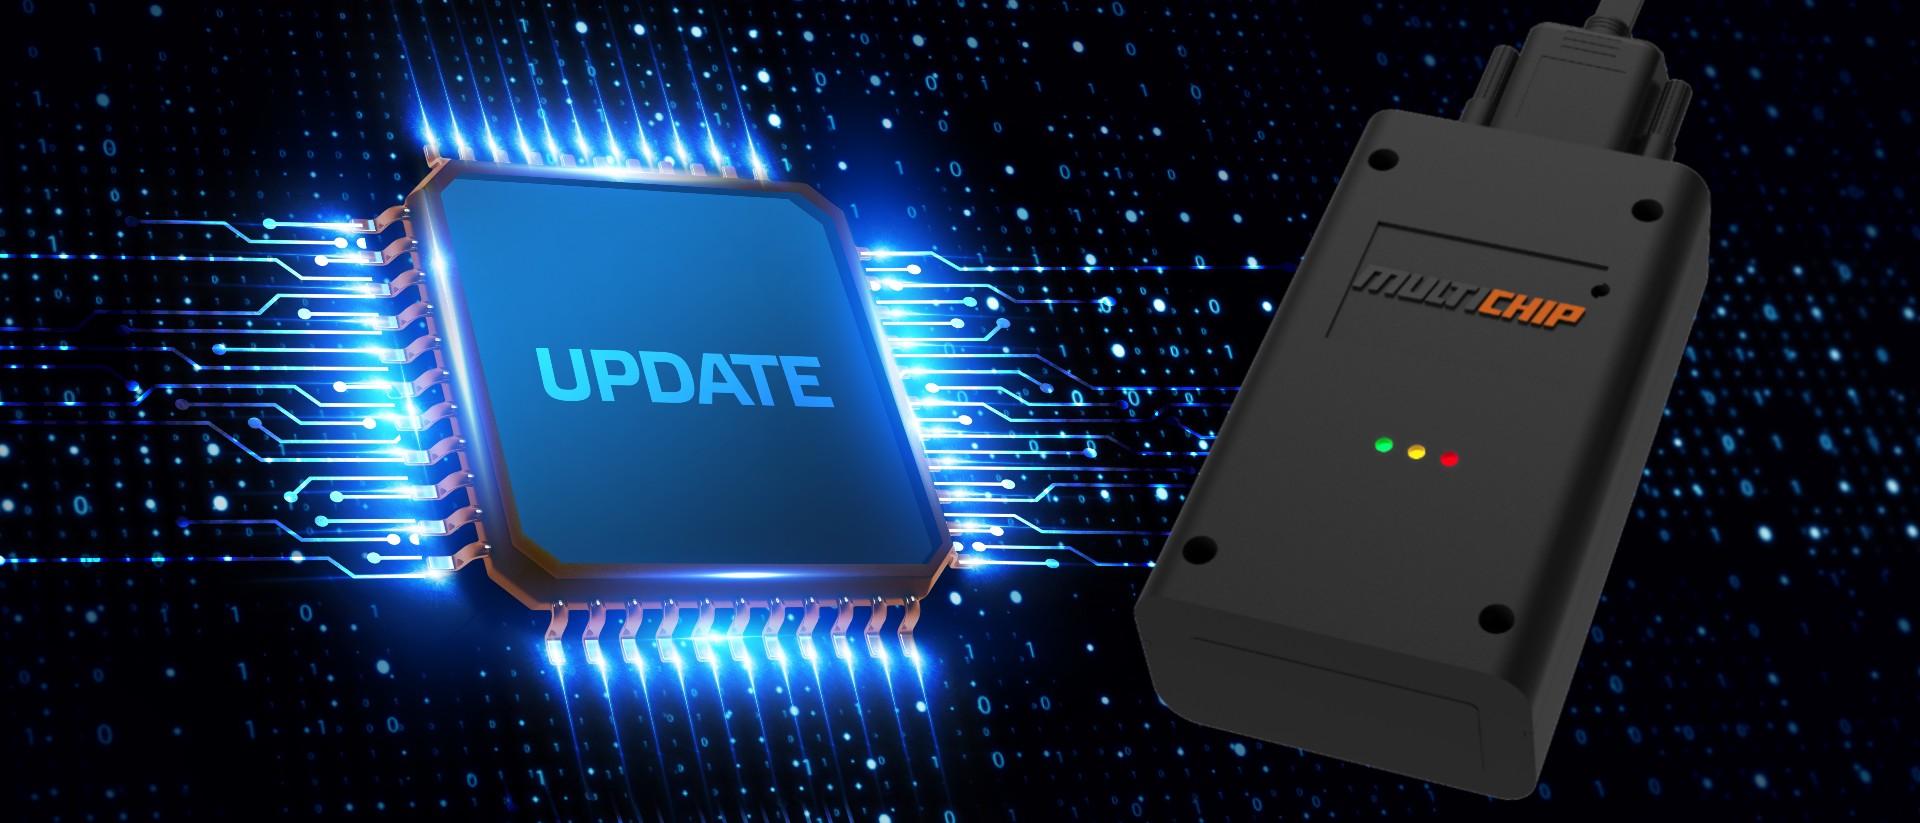 update-multichip